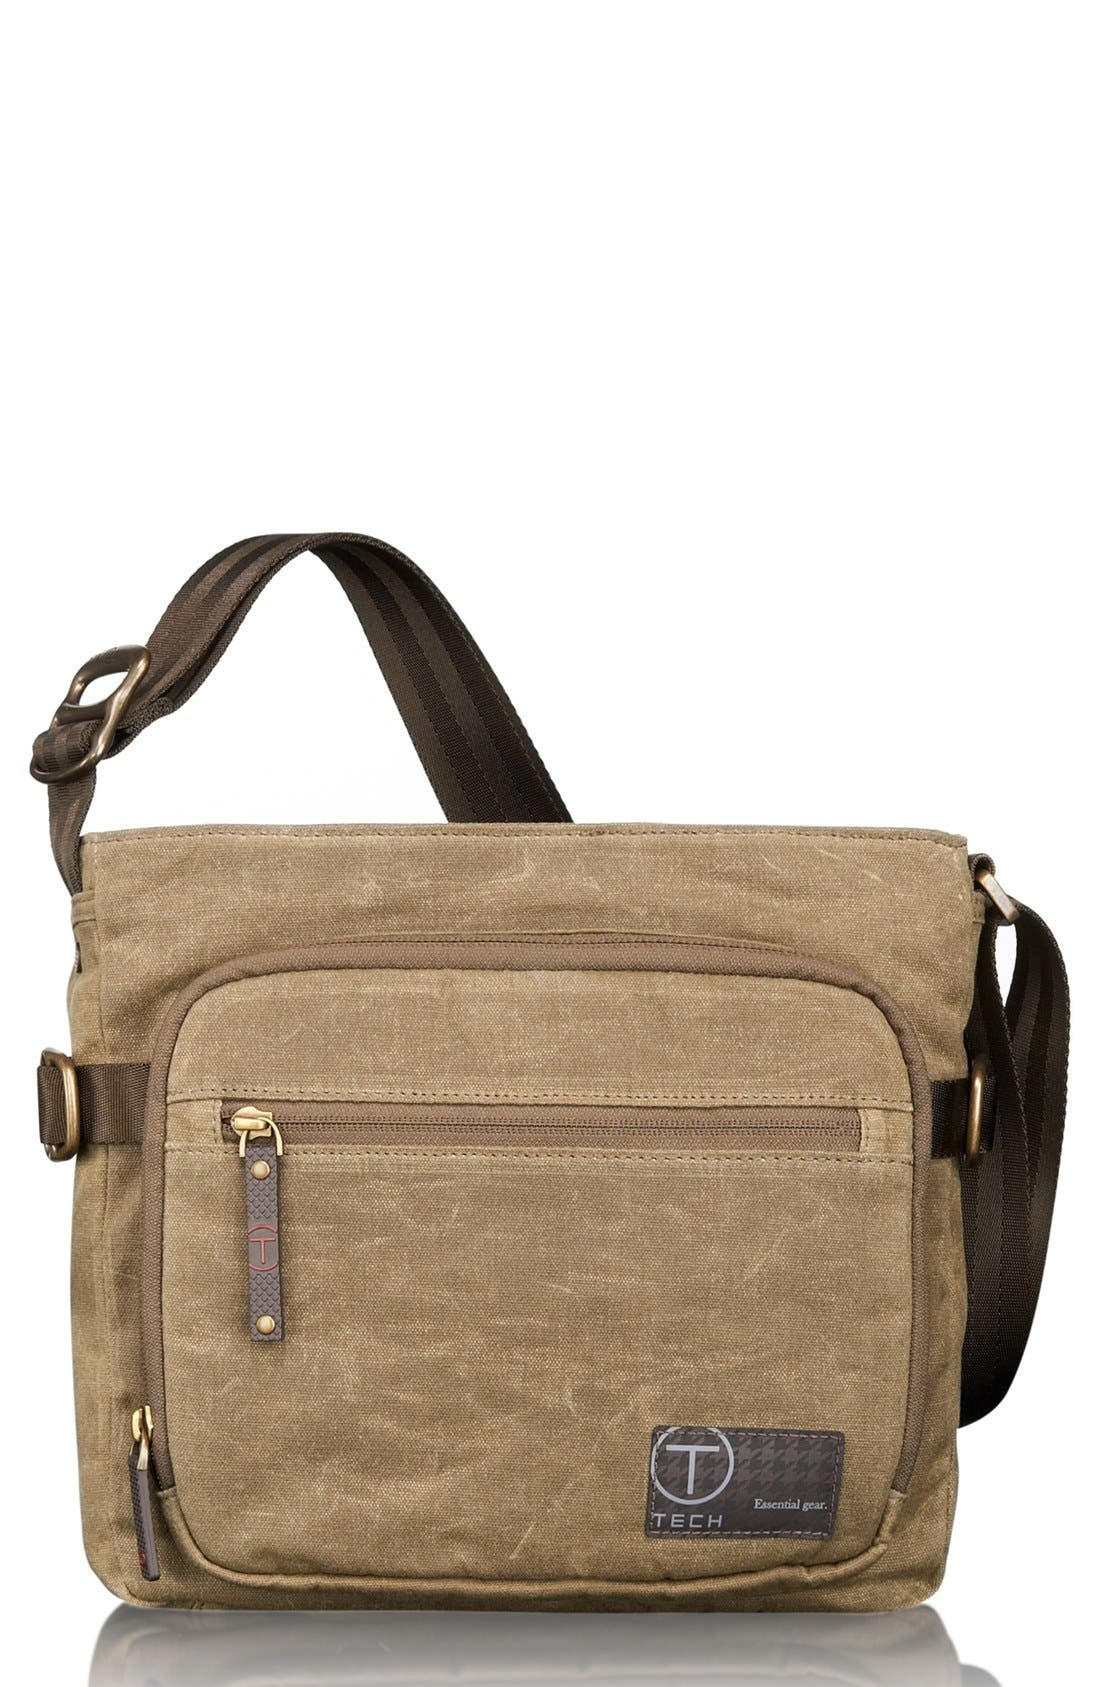 Main Image - T-Tech by Tumi 'Icon - King' Crossbody Bag